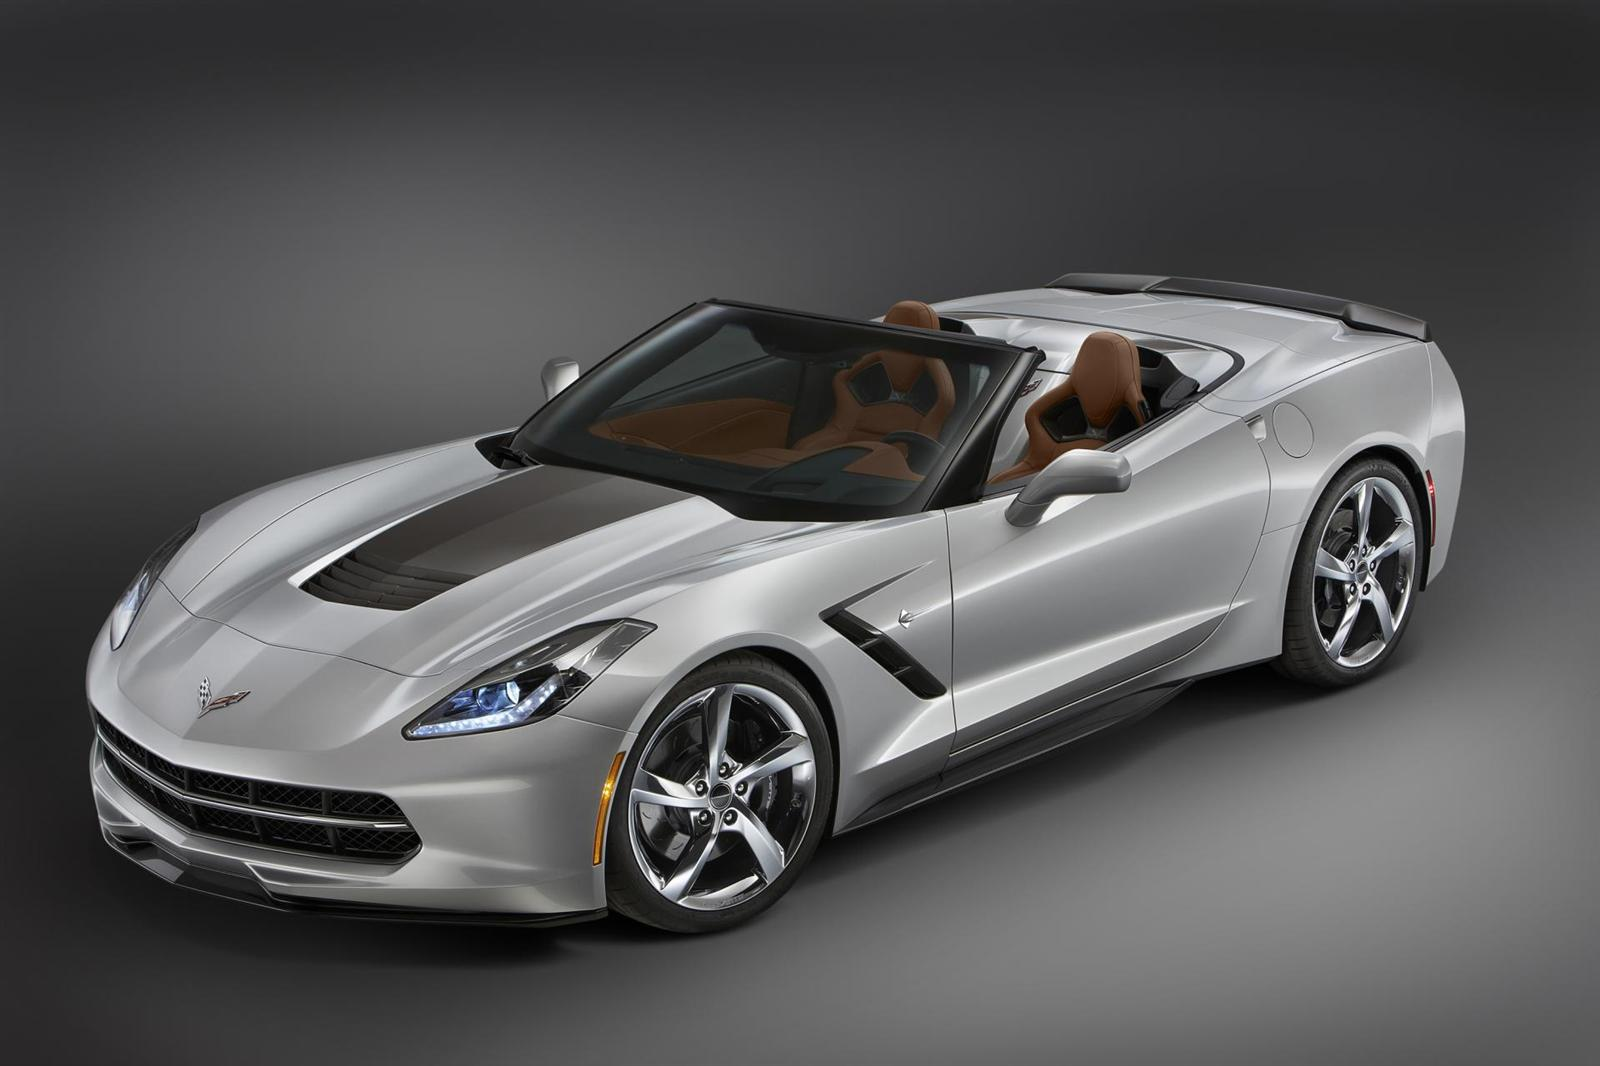 2013 Chevrolet Corvette Stingray Convertible Atlantic Concept